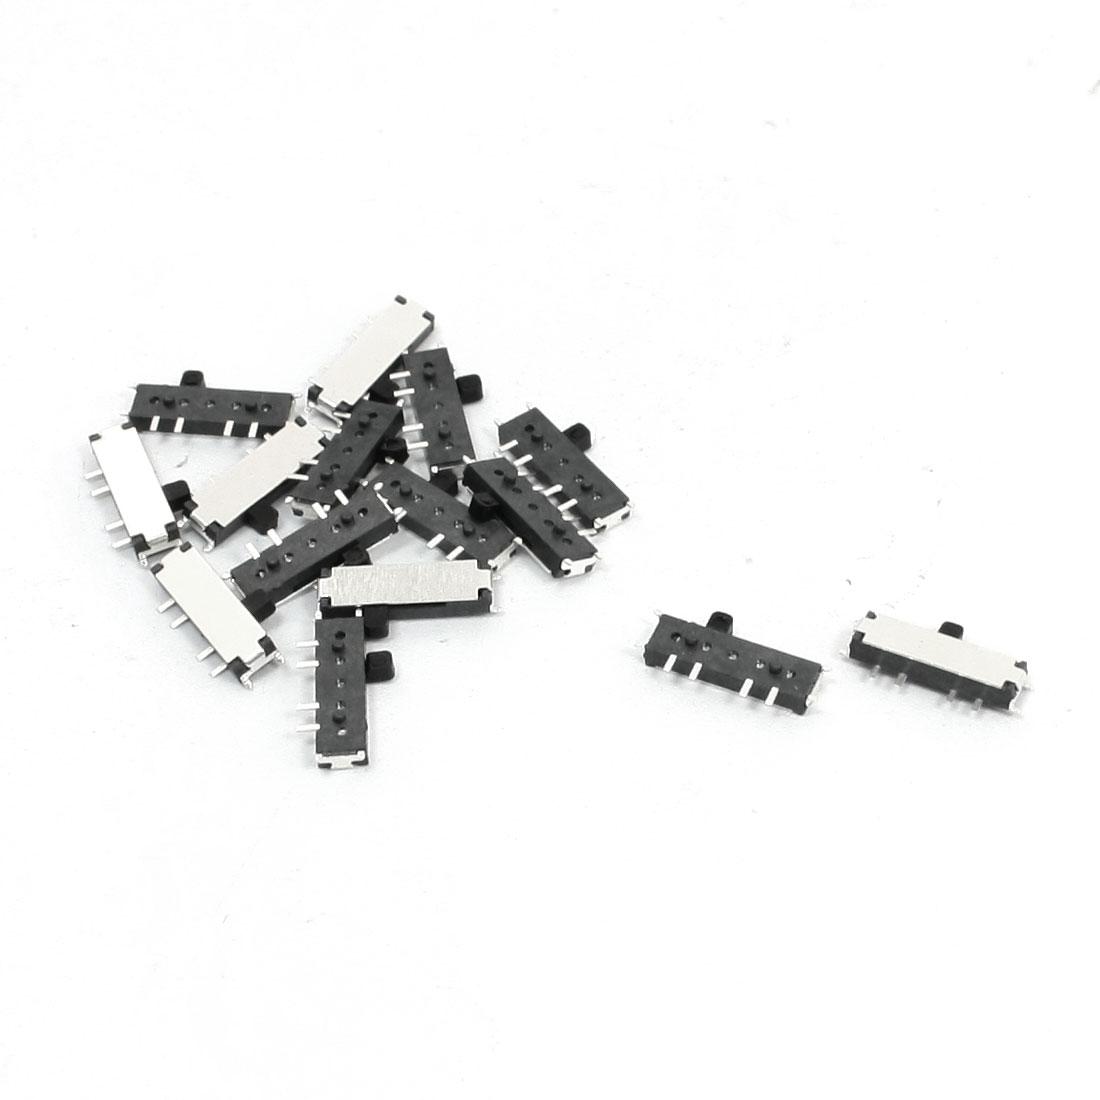 15PCS 8-Pin 3-Position DPDT Panel PCB Mini SMD SMT Slide Switch 11 x 5 x 1.5mm